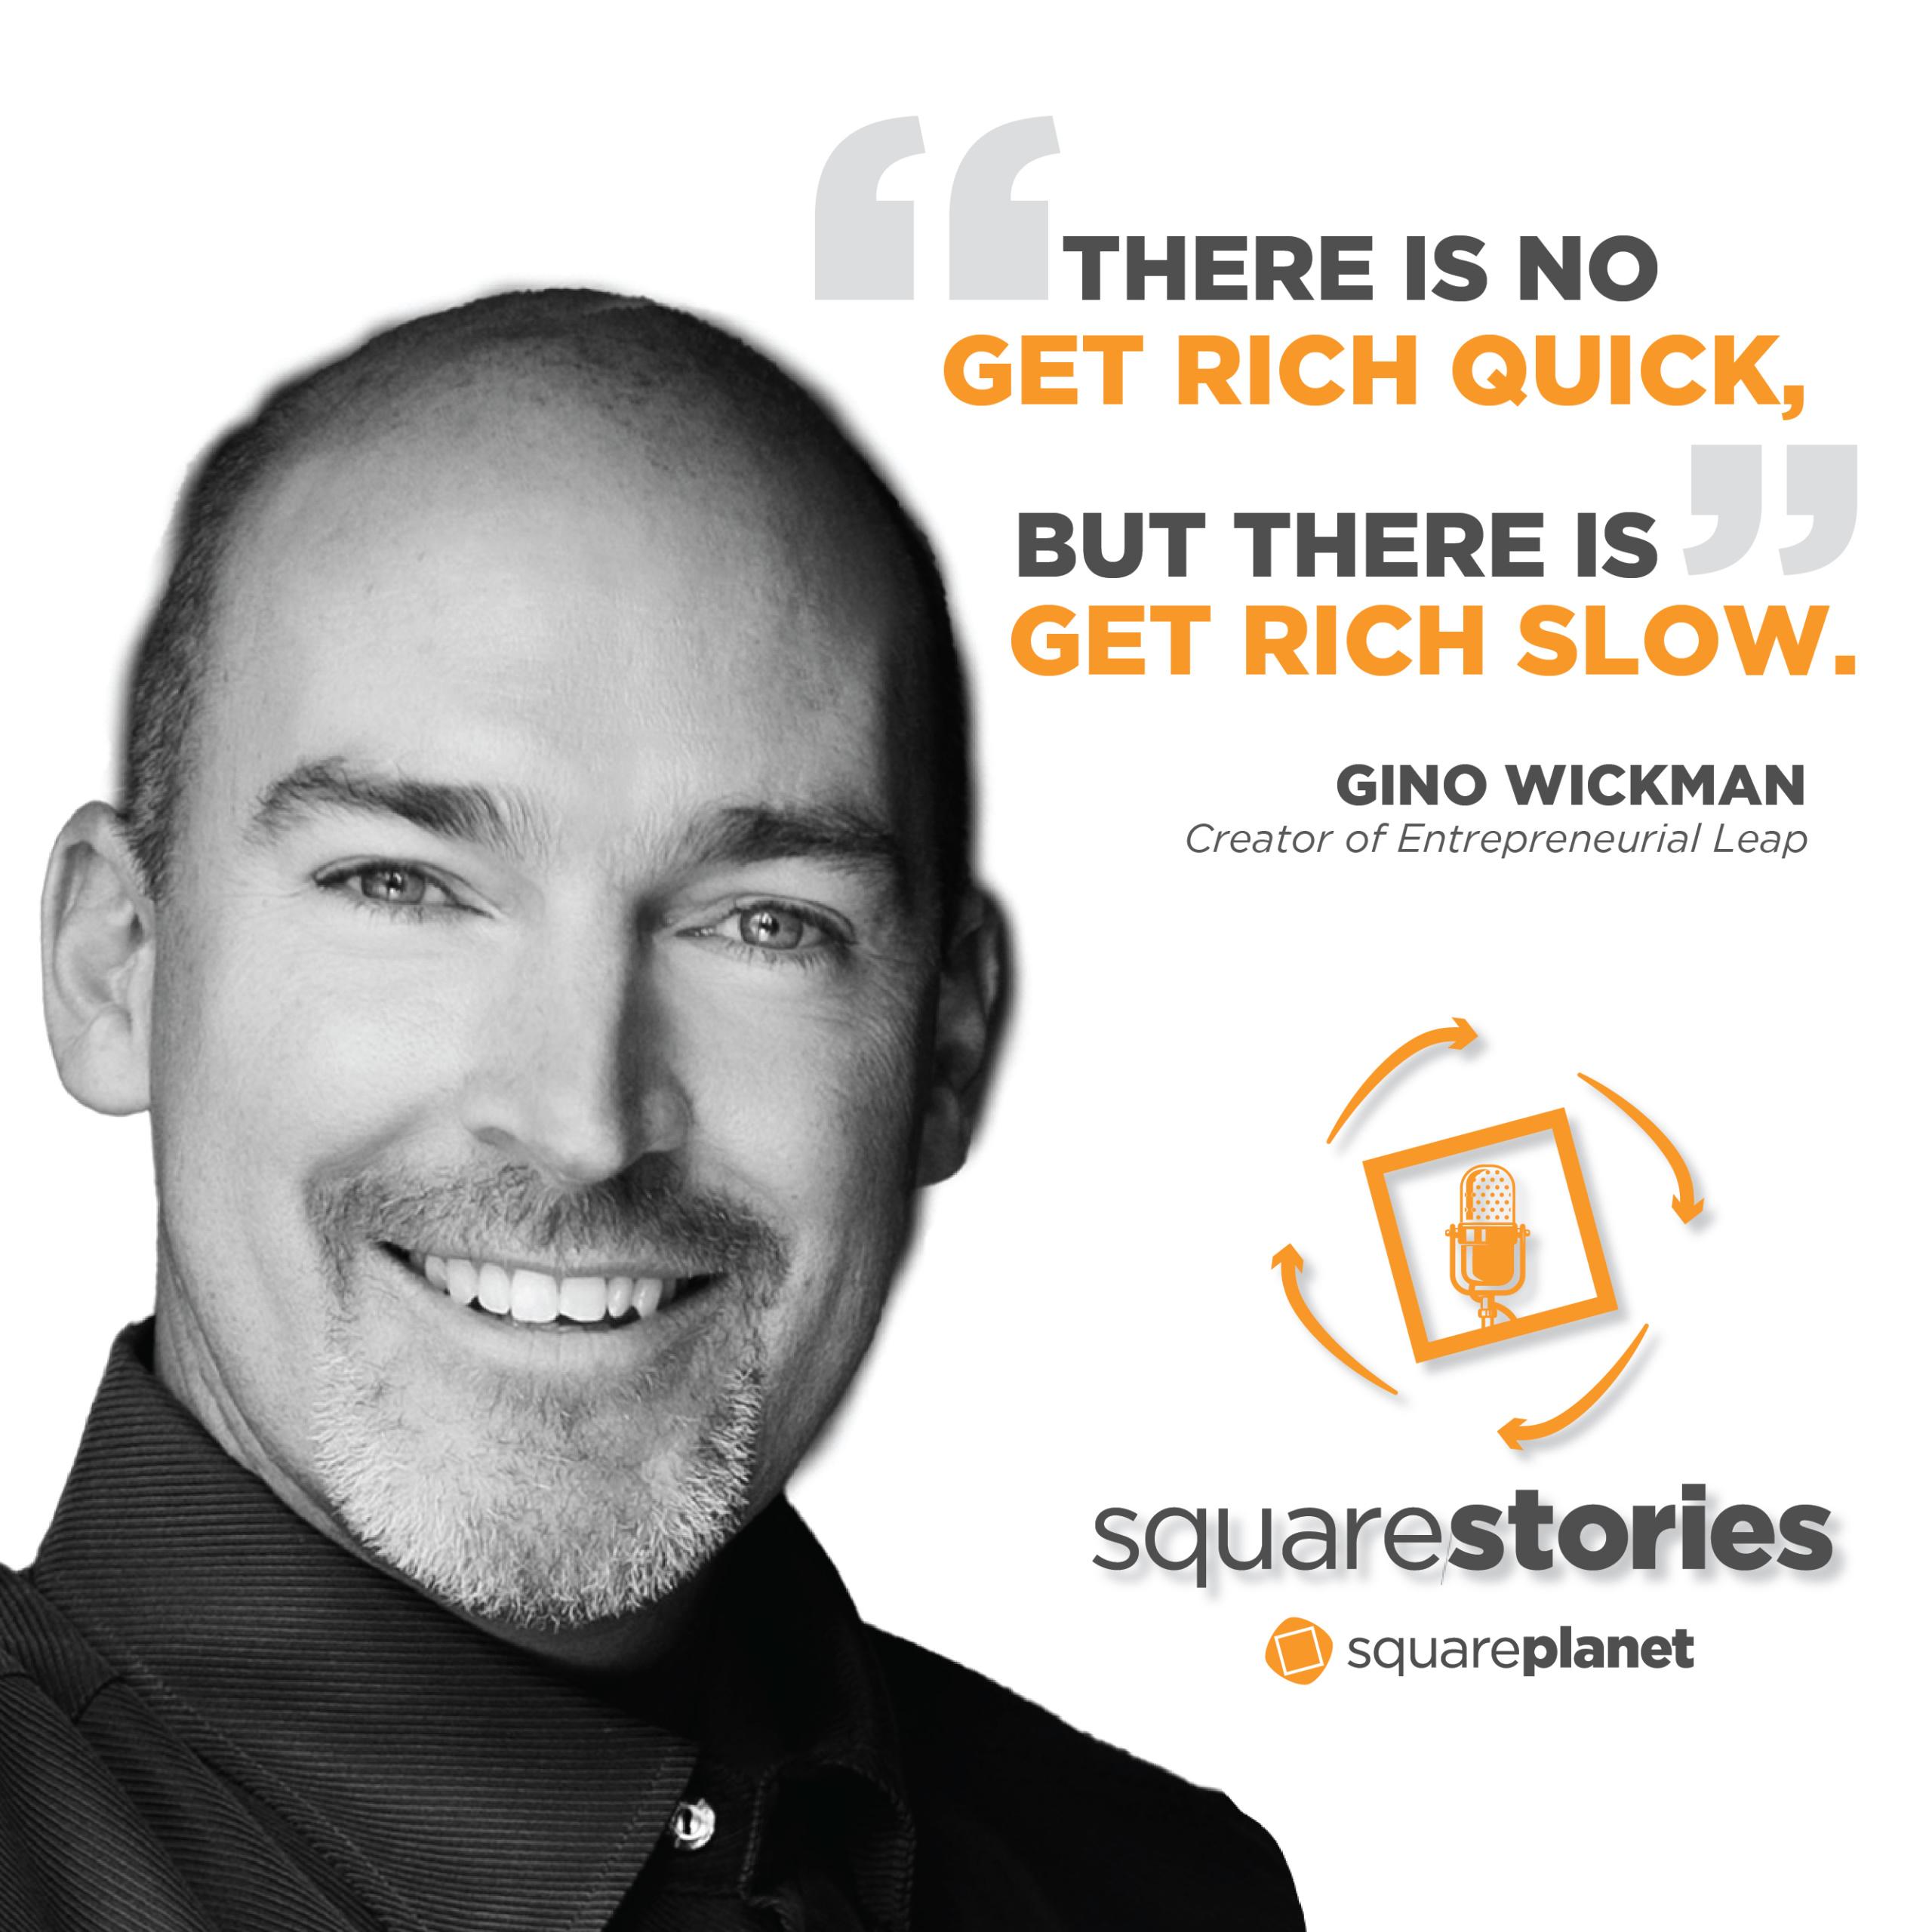 Gino Wickman, Entrepreneurial Leap